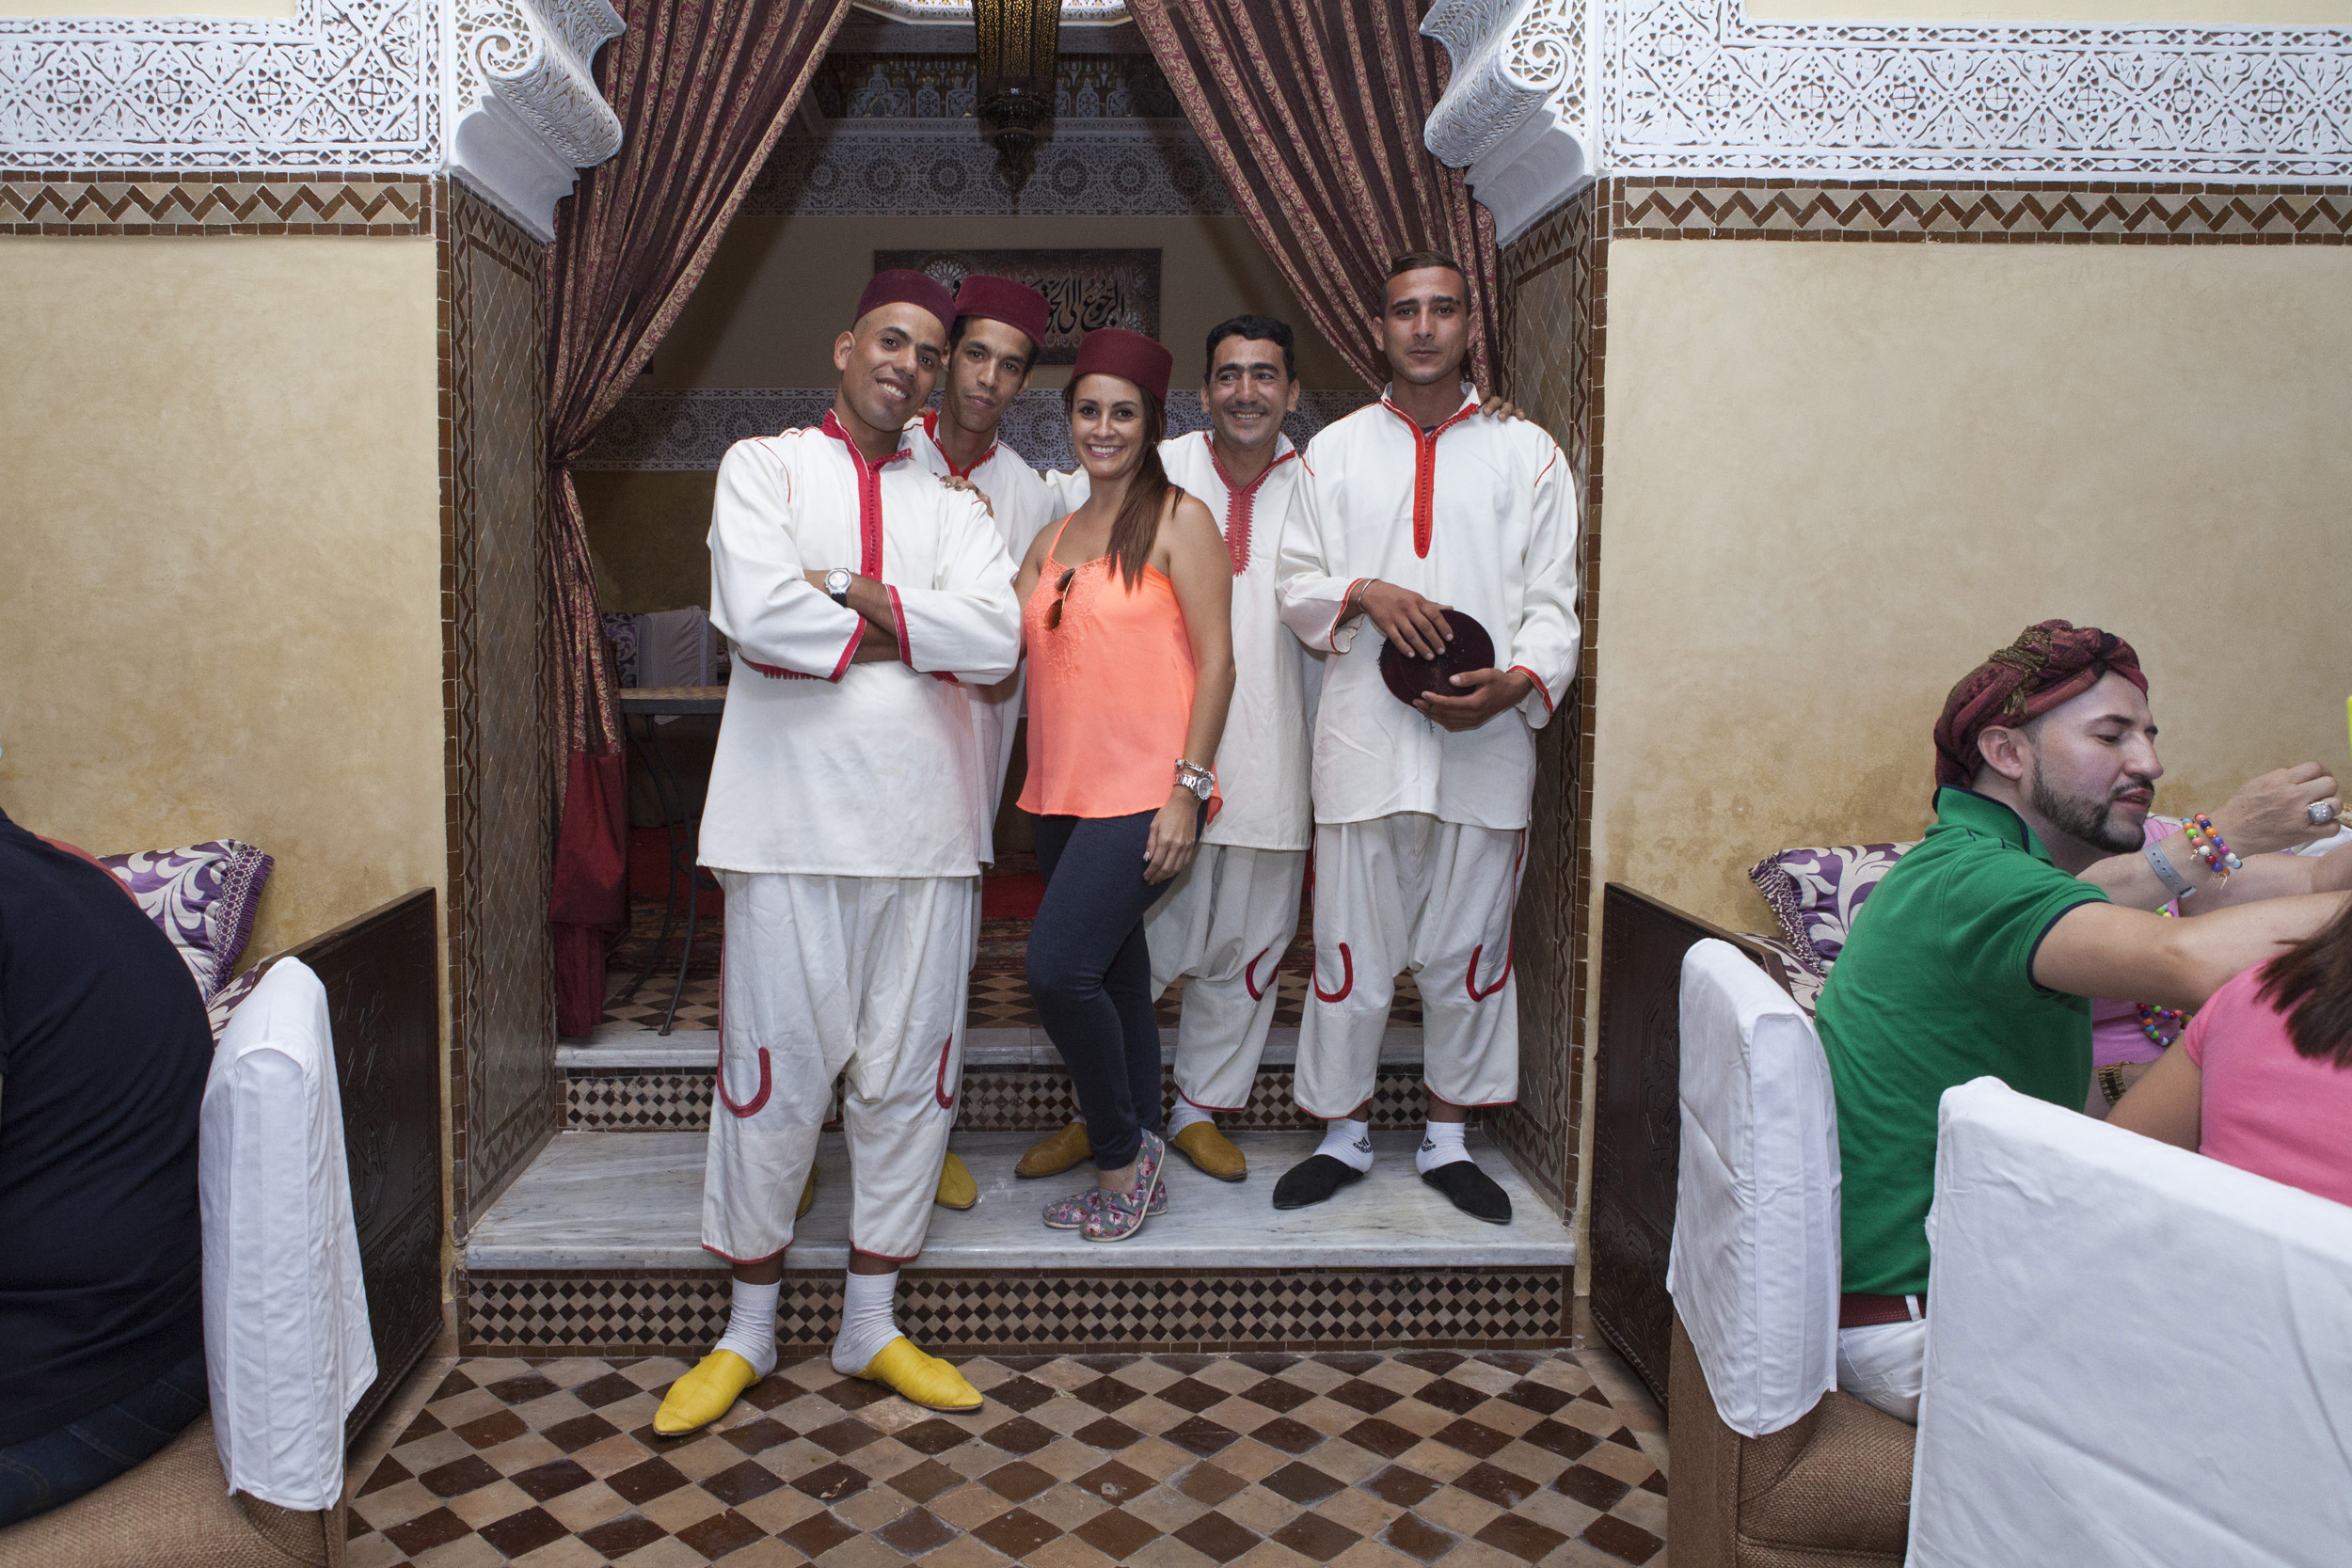 marrakech_2_convencion_anual_salerm_cosmetics_proline_15